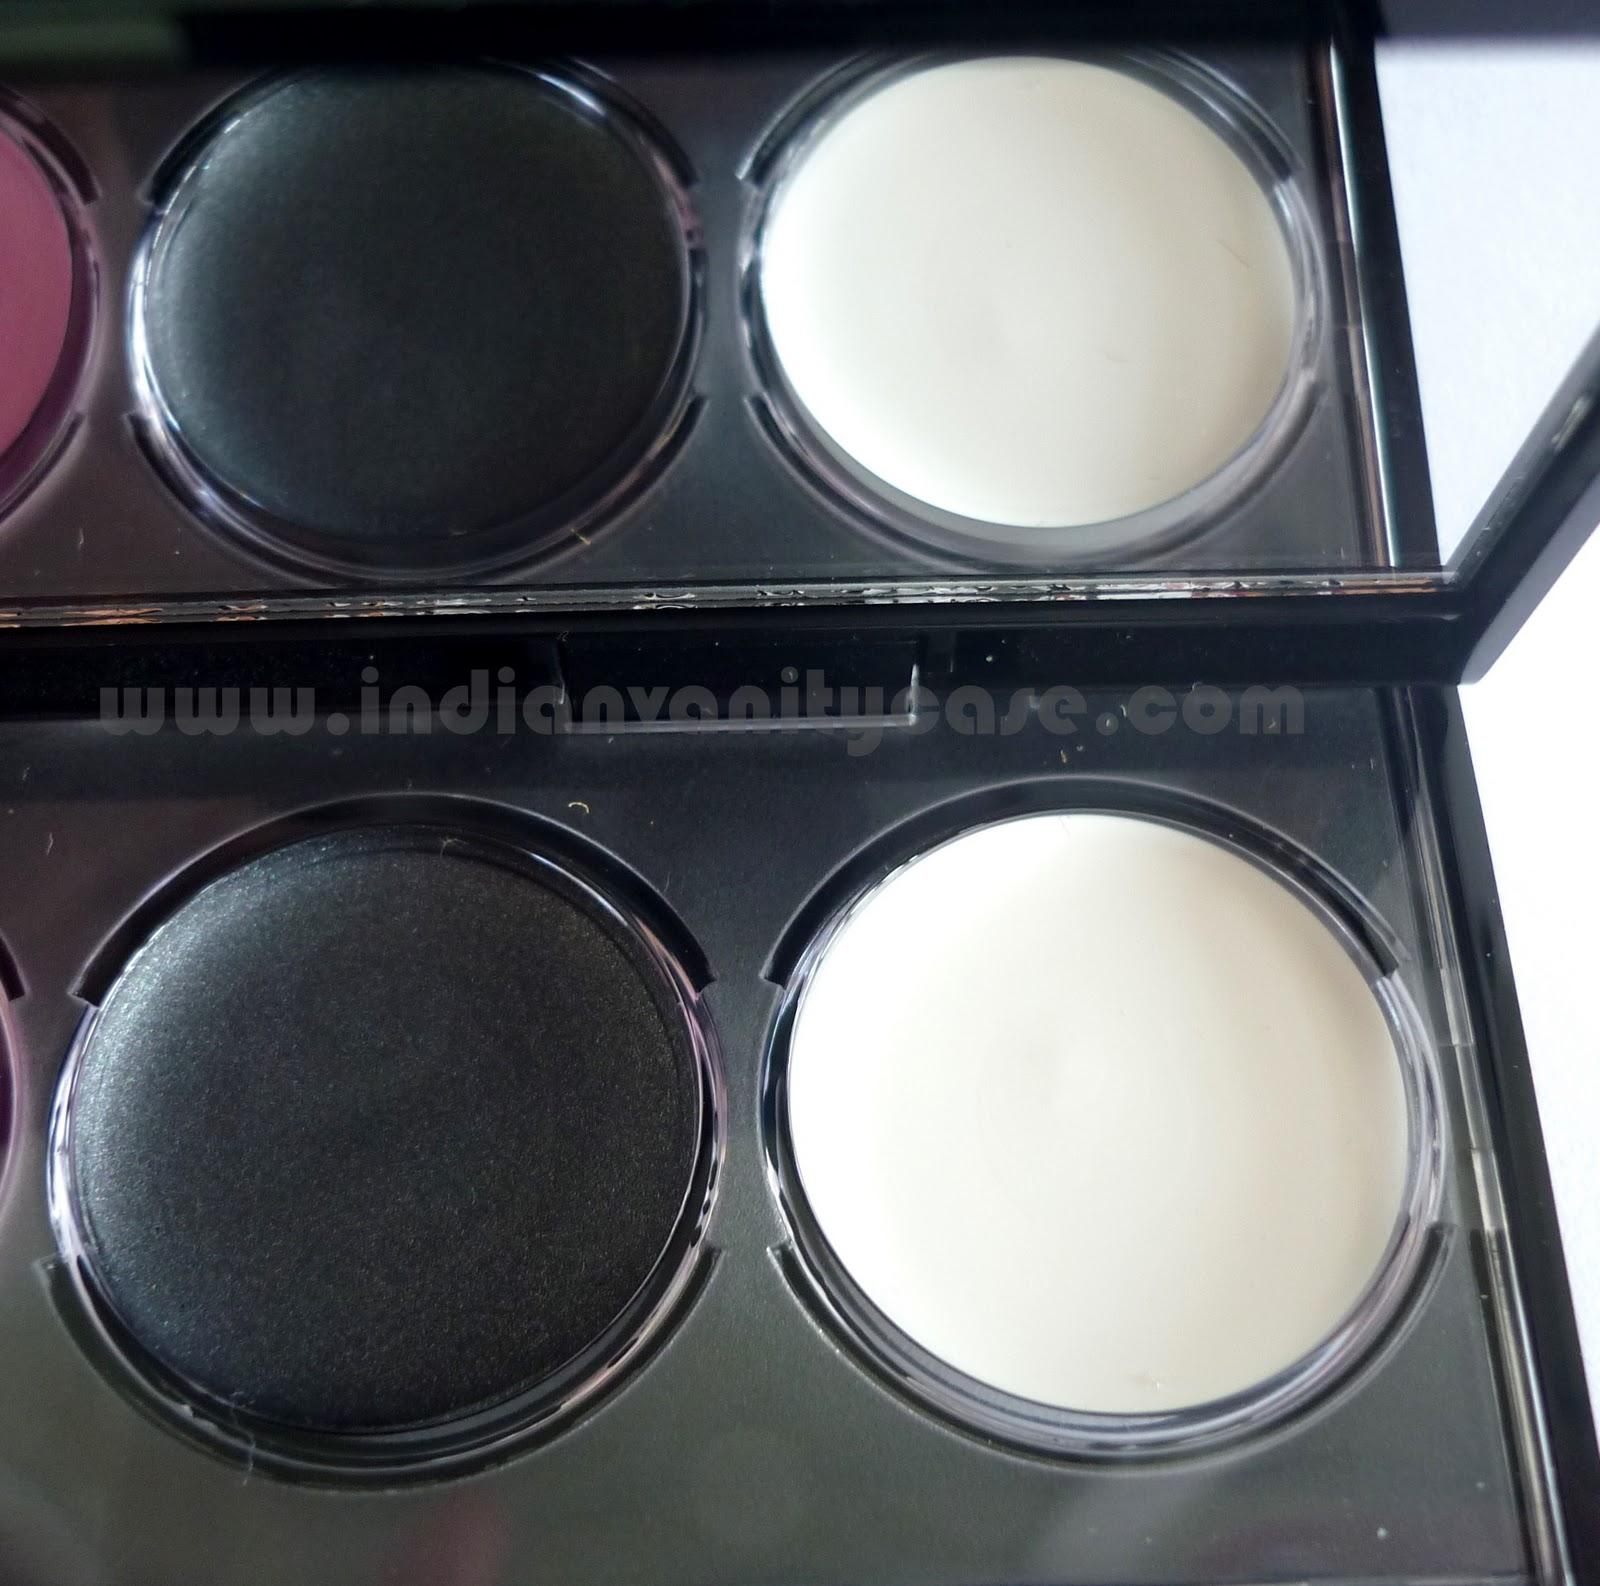 Revlon Black Magic: Indian Vanity Case: Revlon Illuminance Creme Shadow In